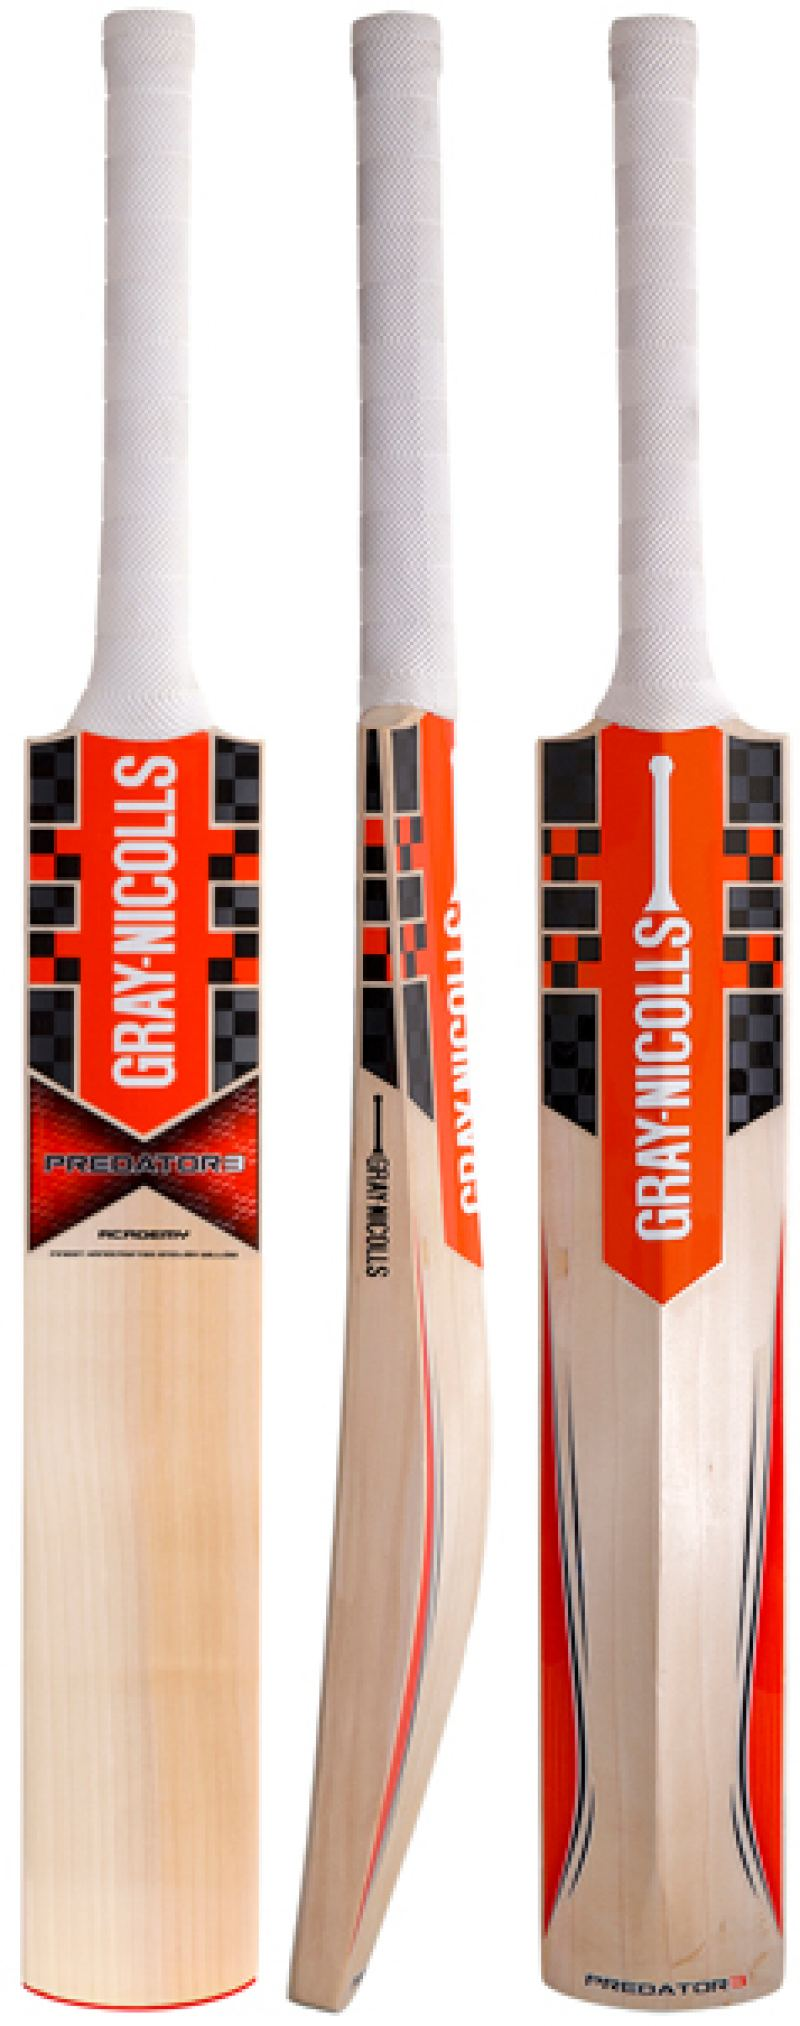 Gray Nicolls Predator 3 Academy Junior Cricket Bat